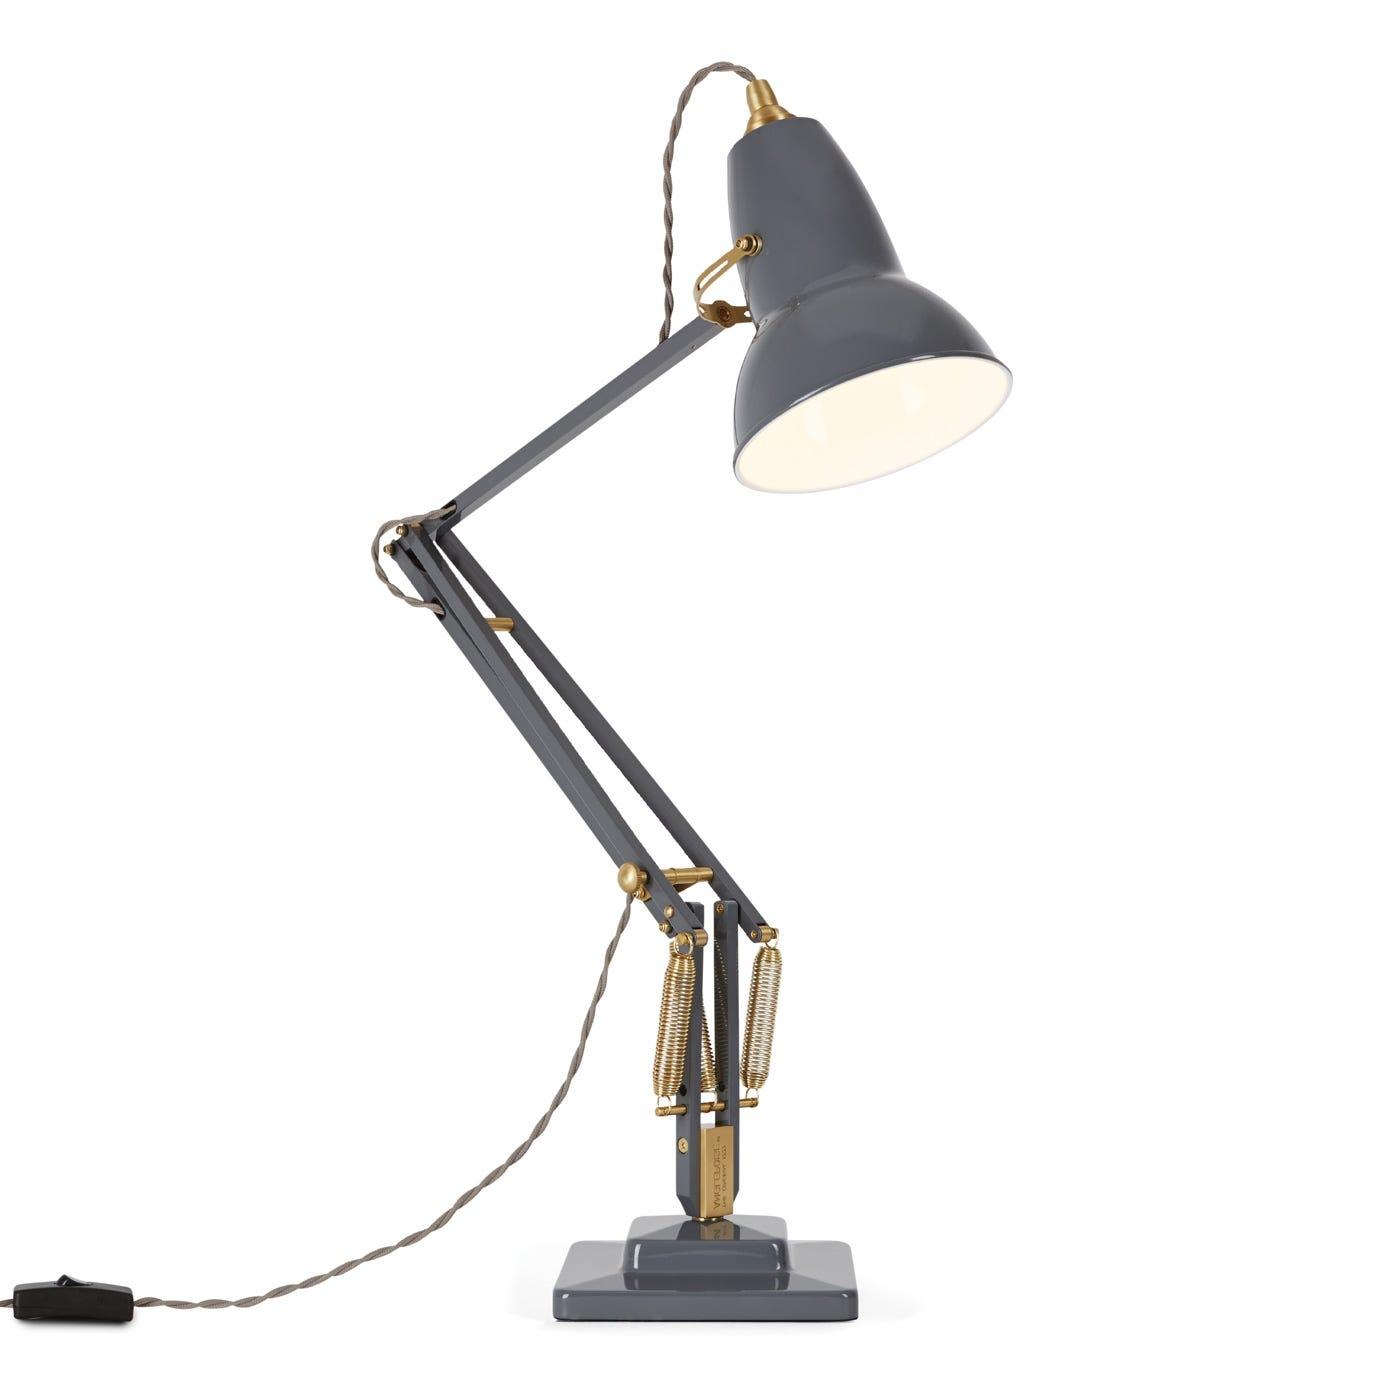 Original 1227 Brass Desk Lamp